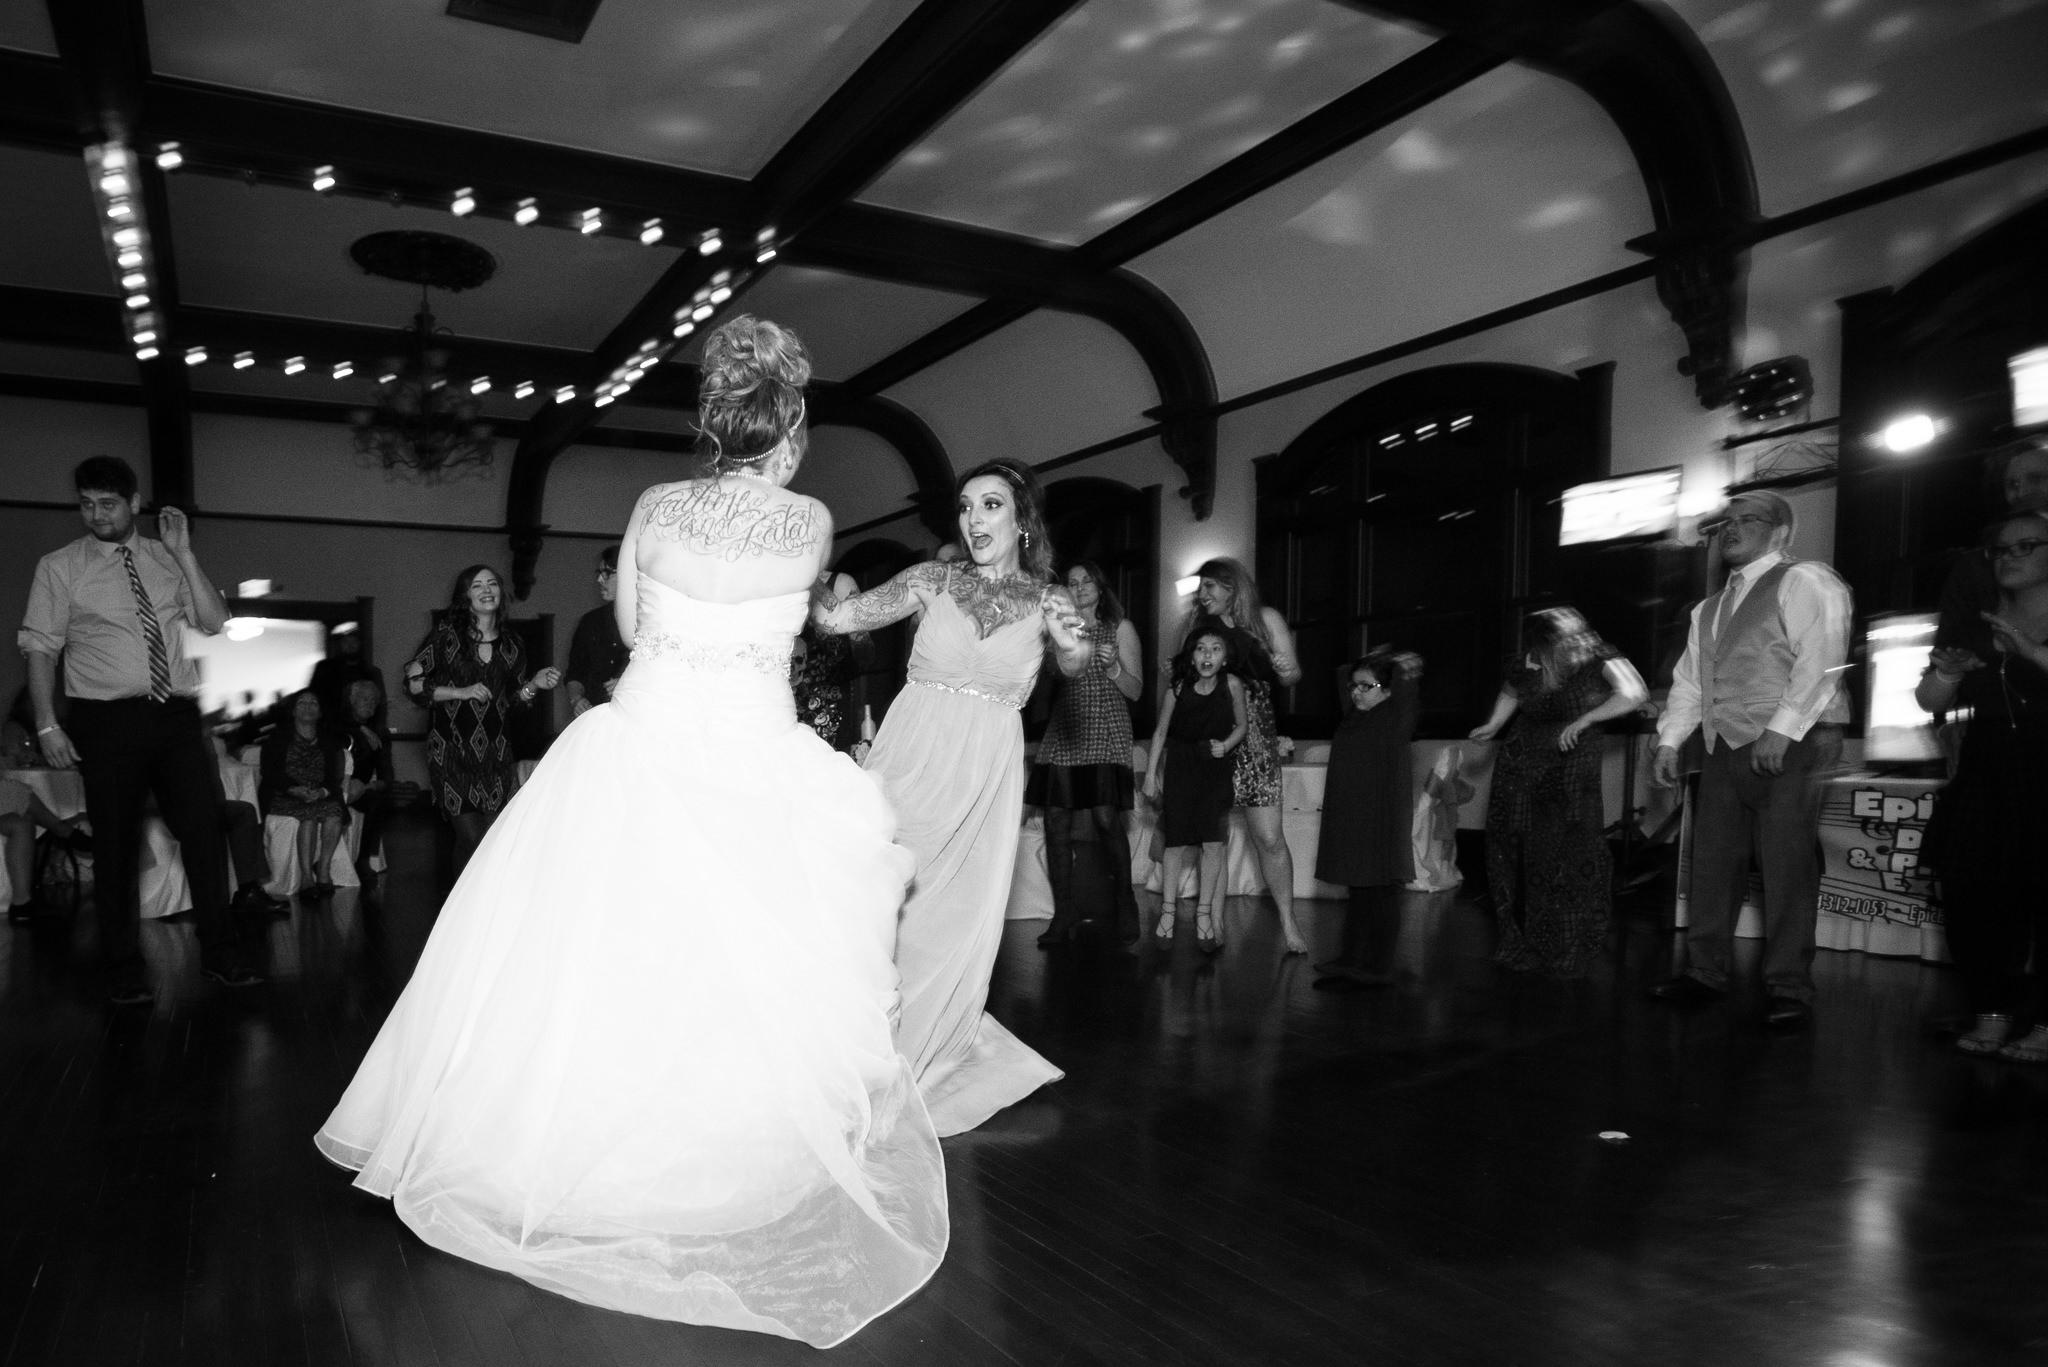 Grant Beachy Photo portrait wedding goshen elkhart south bend chicago-057.jpg